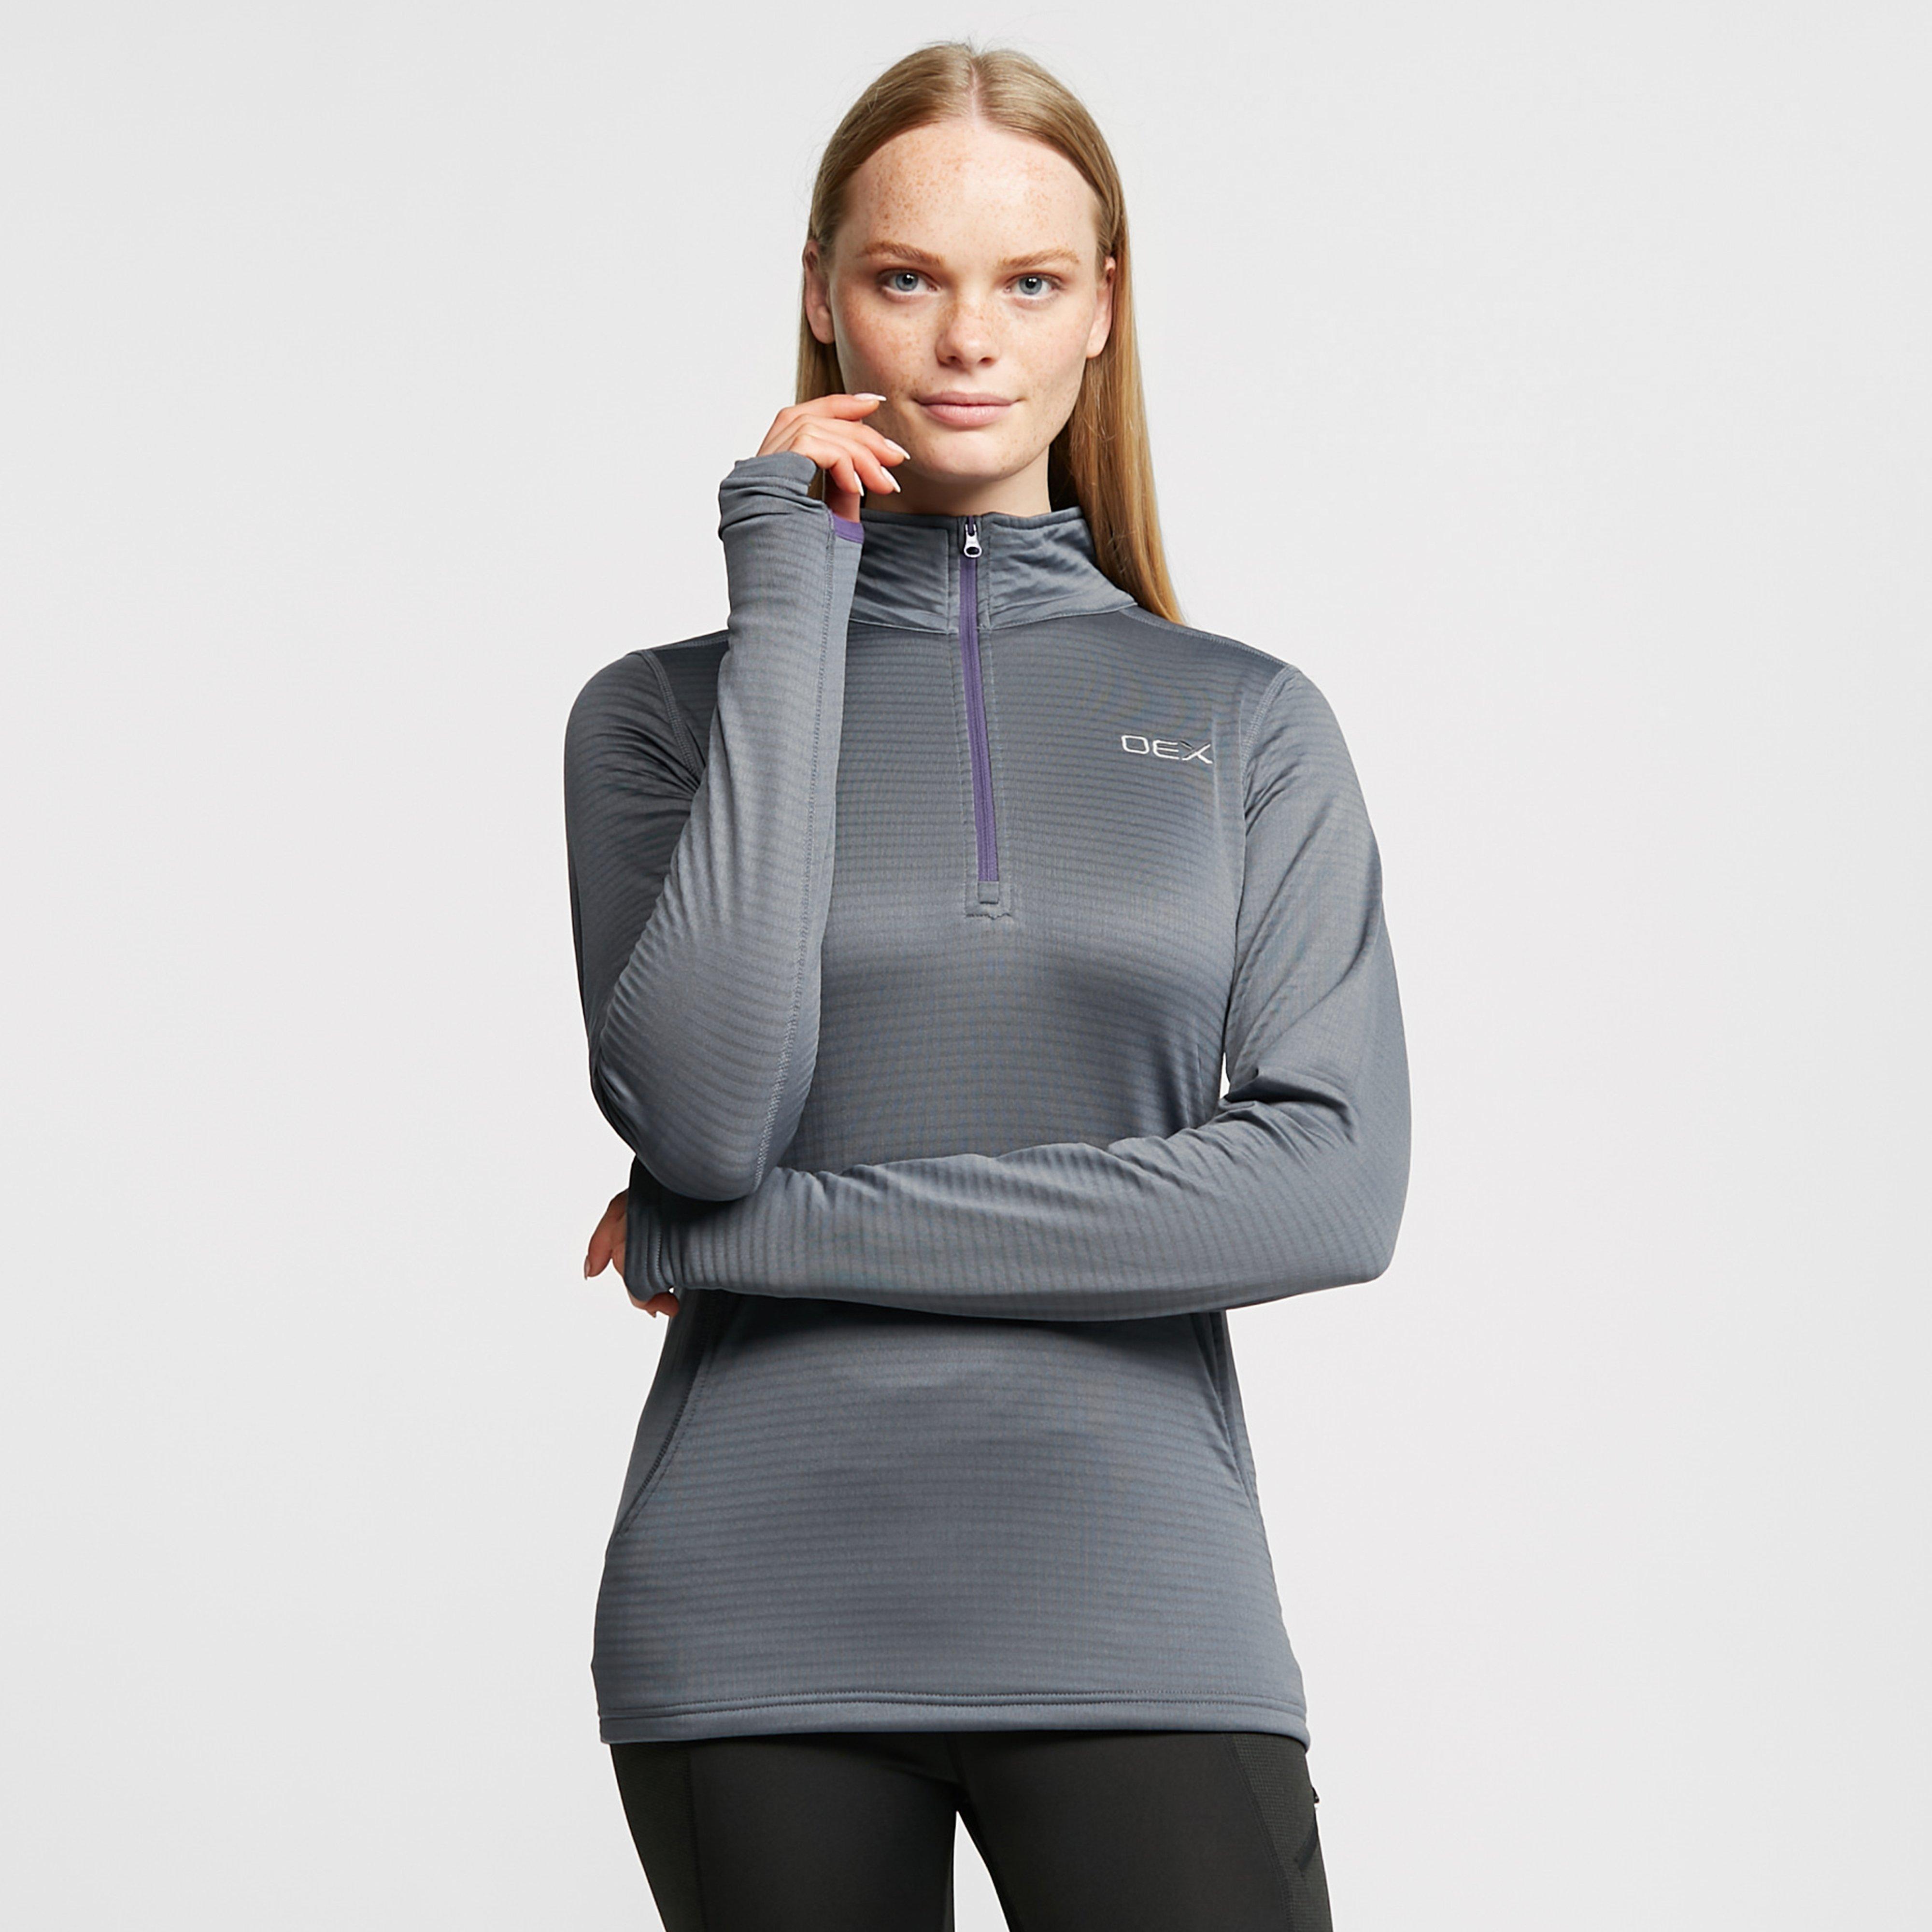 Oex Oex Womens Flint Half Zip Fleece, Grey